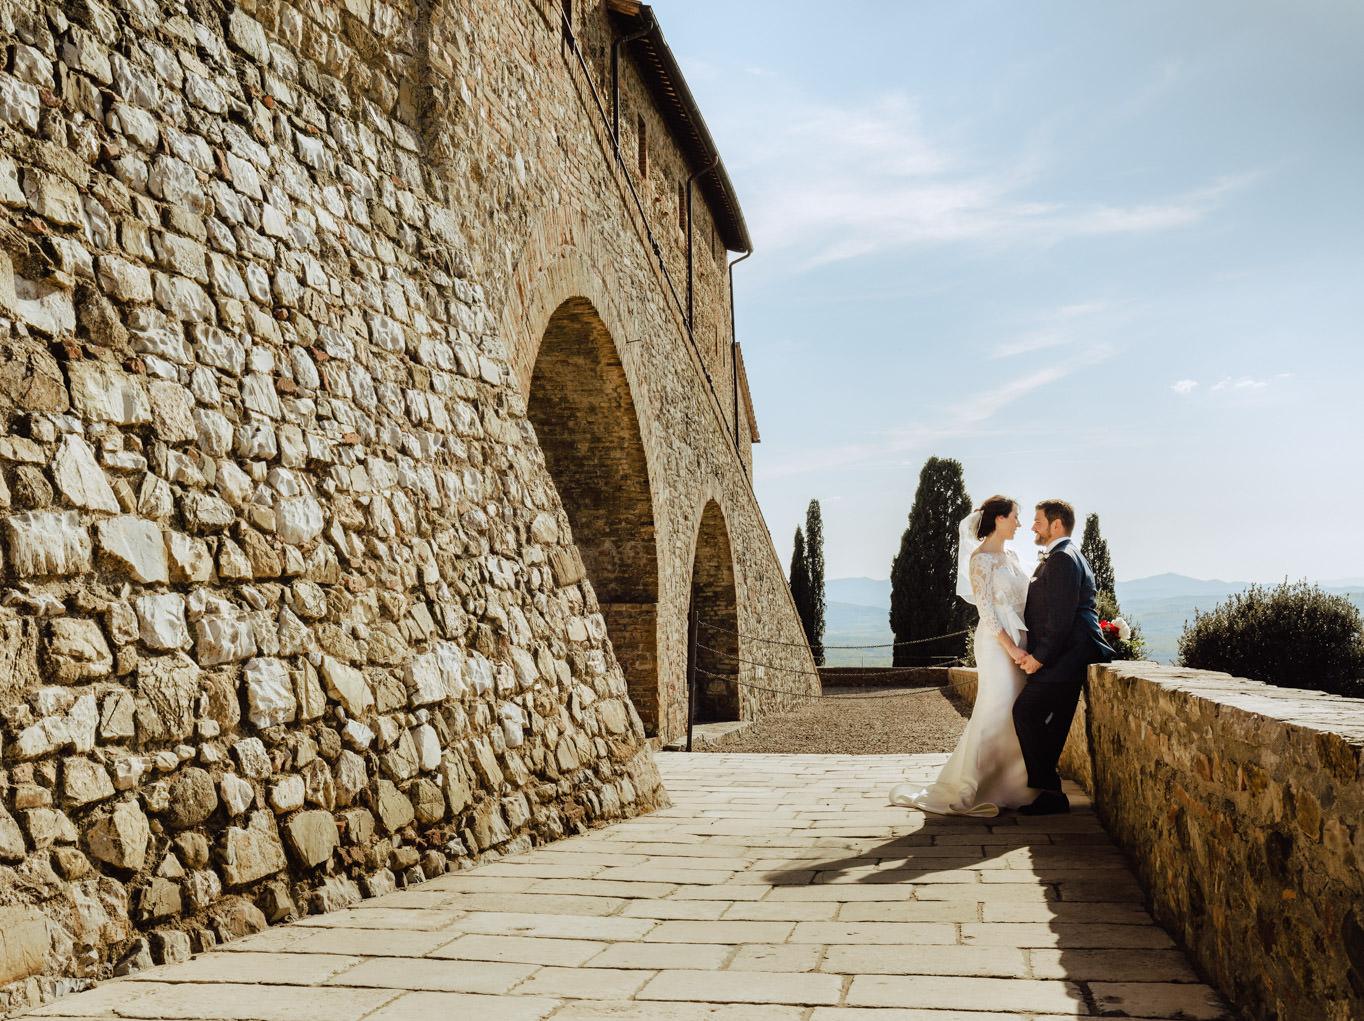 portraits wedding castello di montalcino tuscany